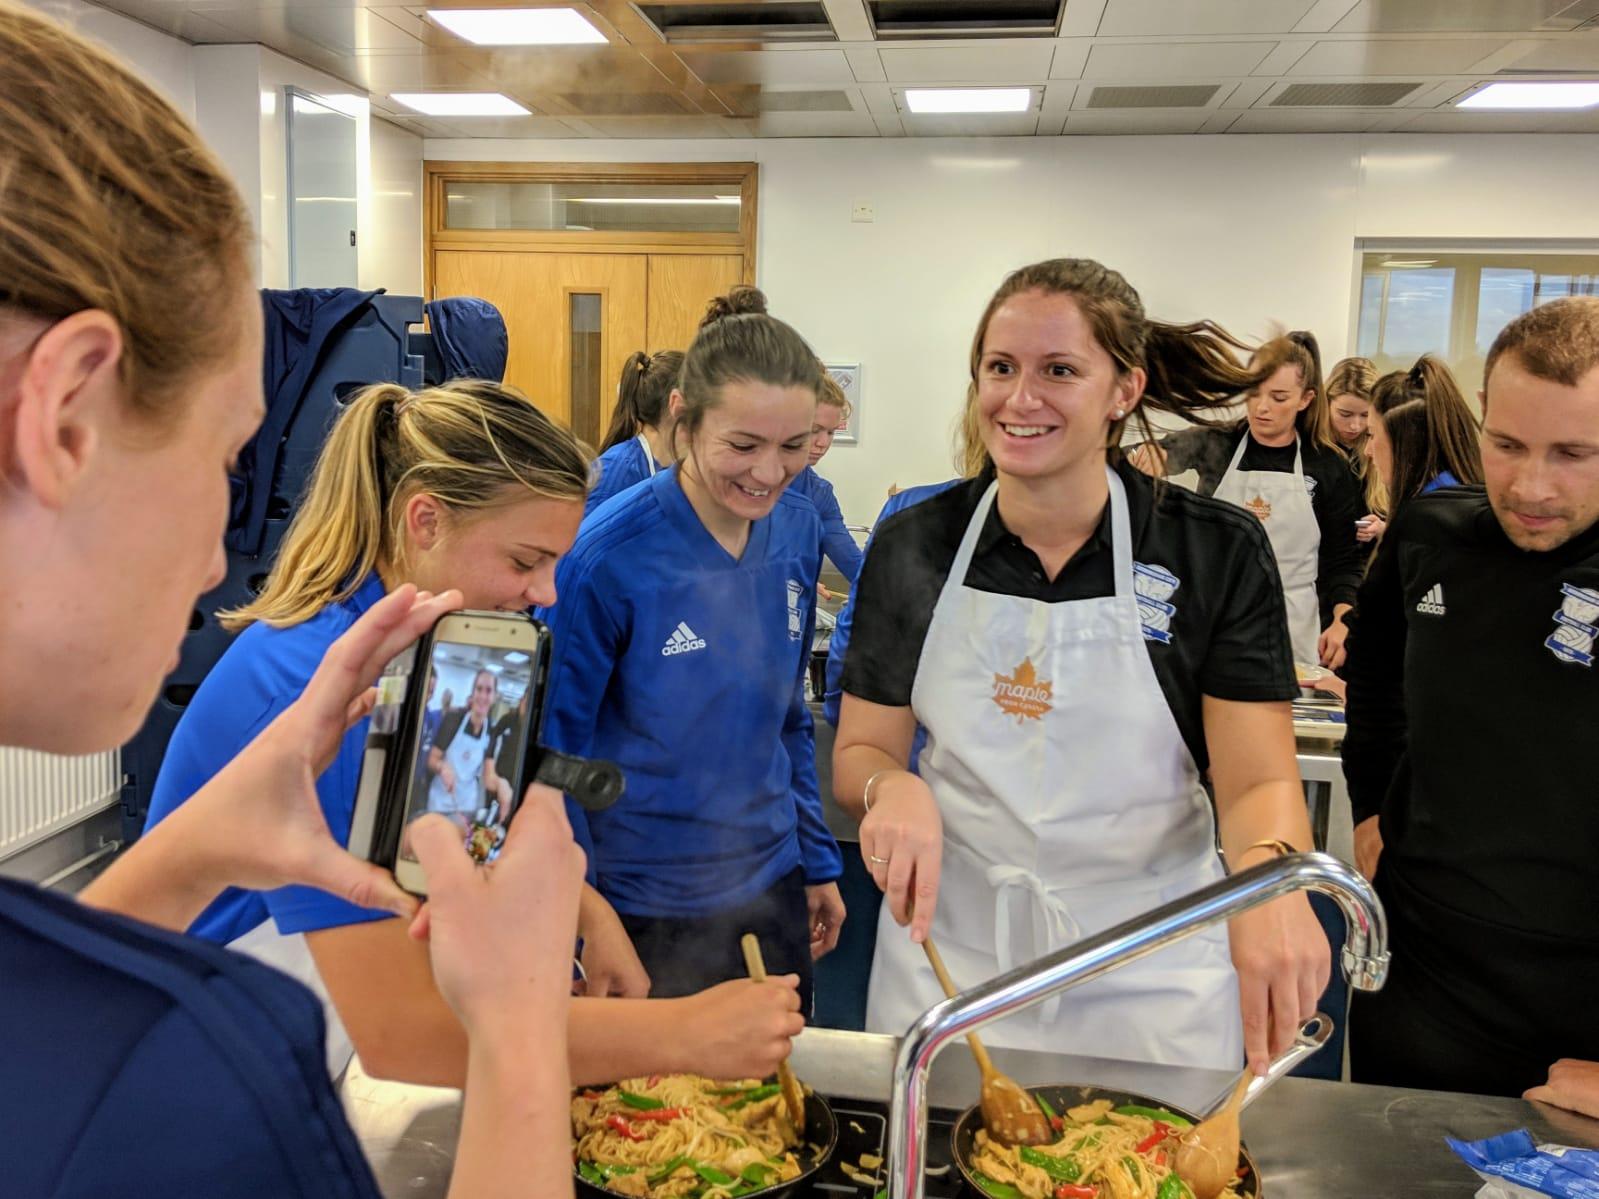 Birmingham City Ladies Fc players preparing the teriyaki stir fry